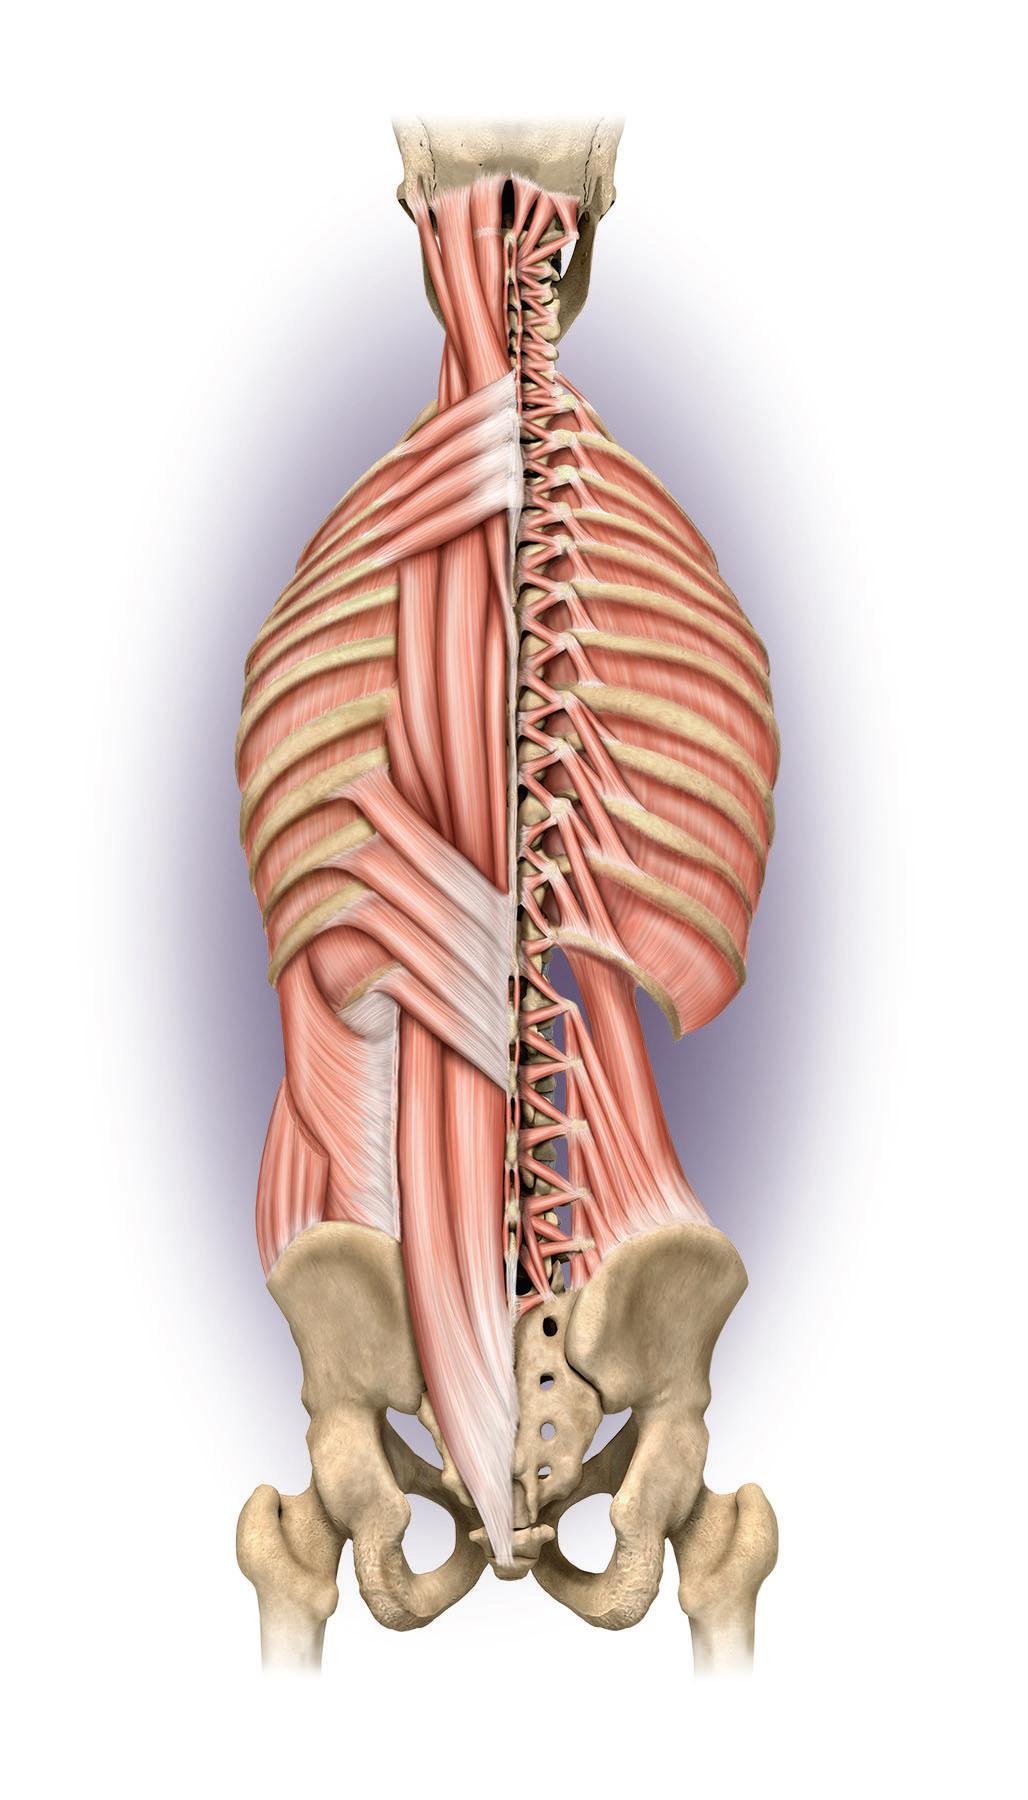 Medical Illustration | Certified Medical Illustrator - Anatomy